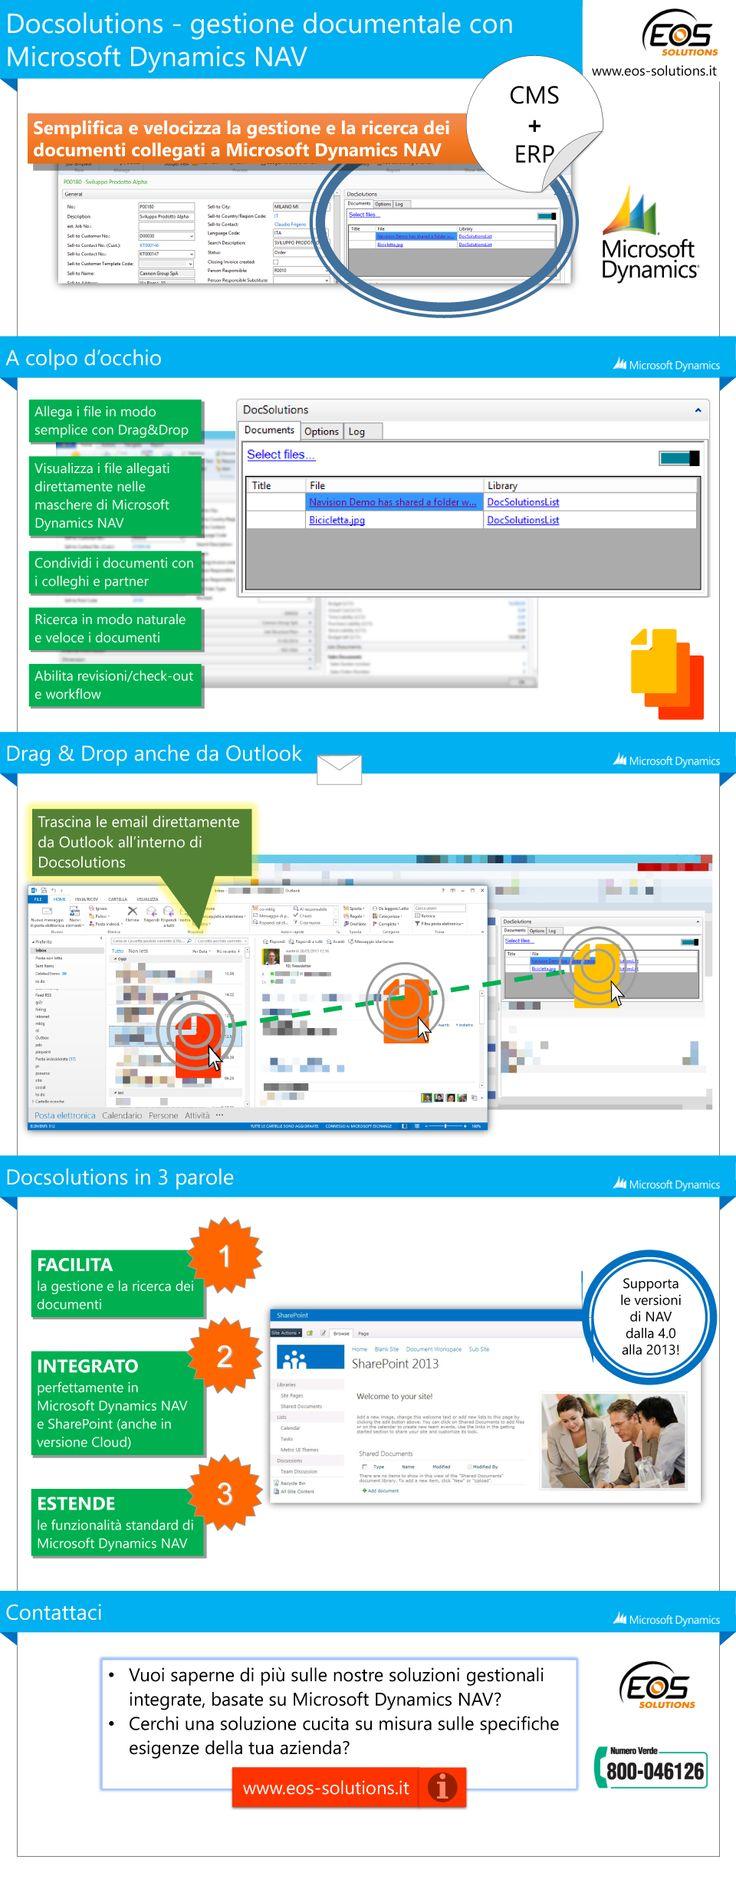 Docsolutions, gestione documentale con Microsoft Dynamics NAV